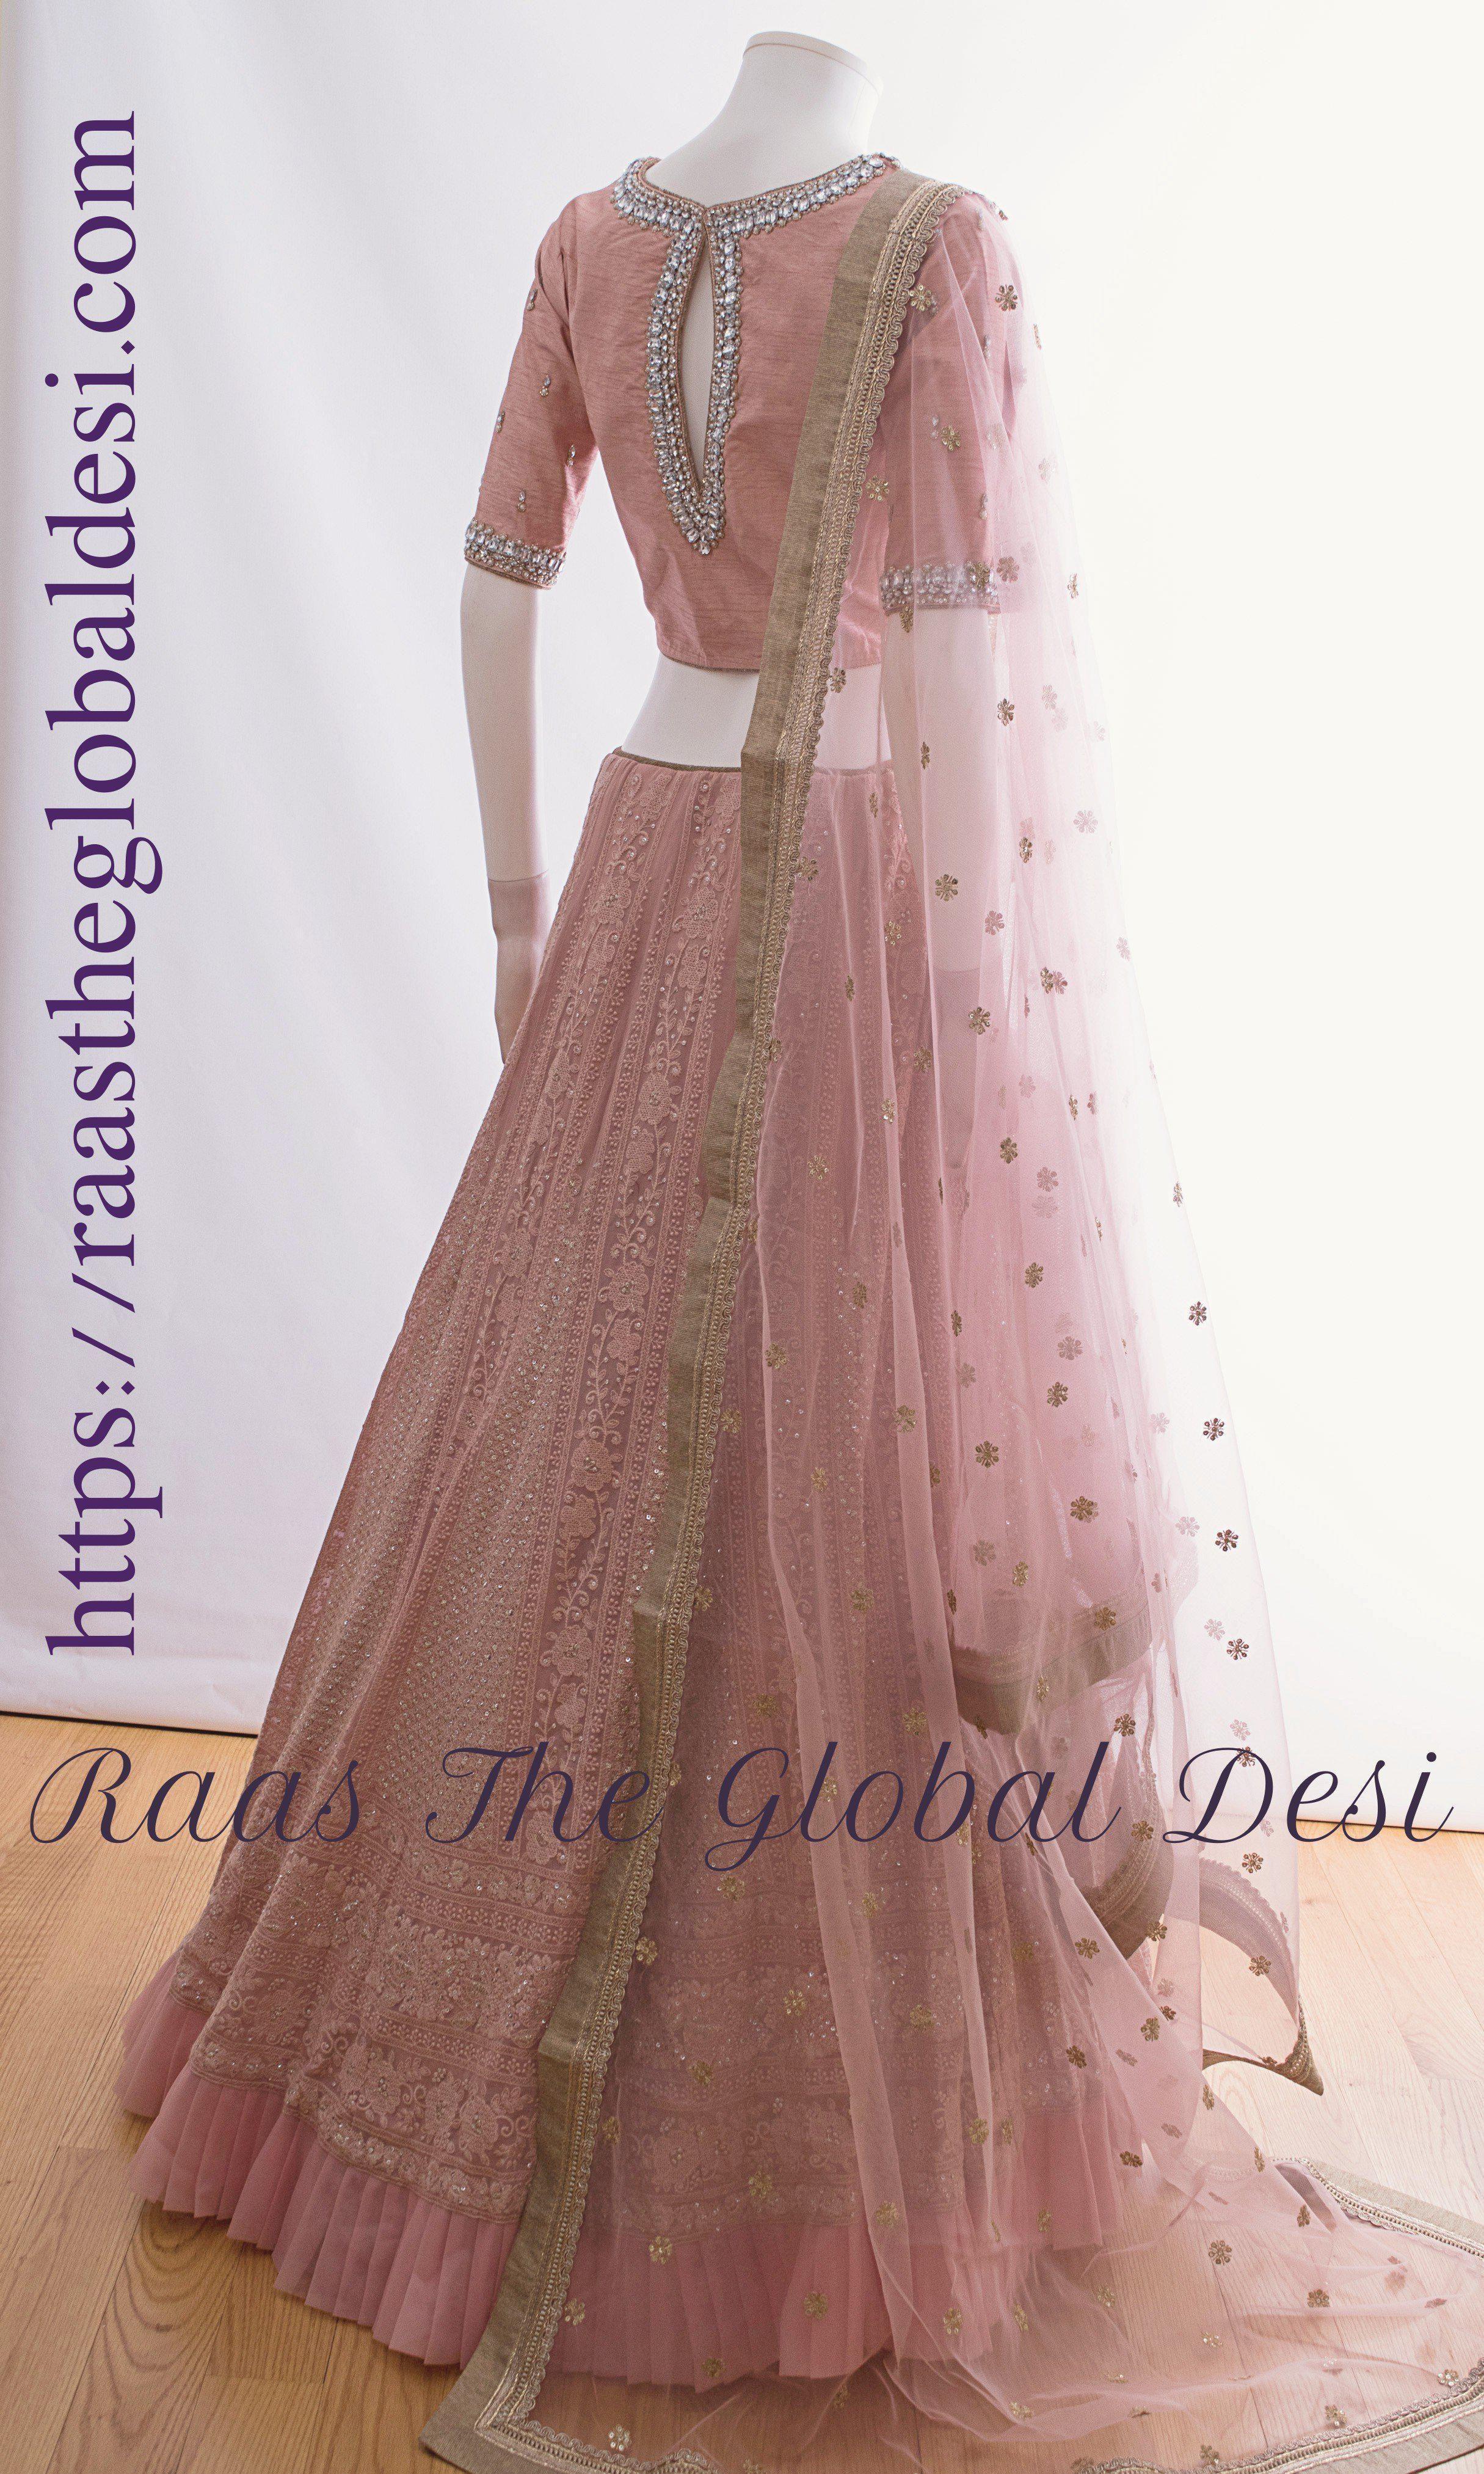 57ca369856 https://raastheglobaldesi.com CC2410 Lehenga Gown, Anarkali, Designer Gowns,